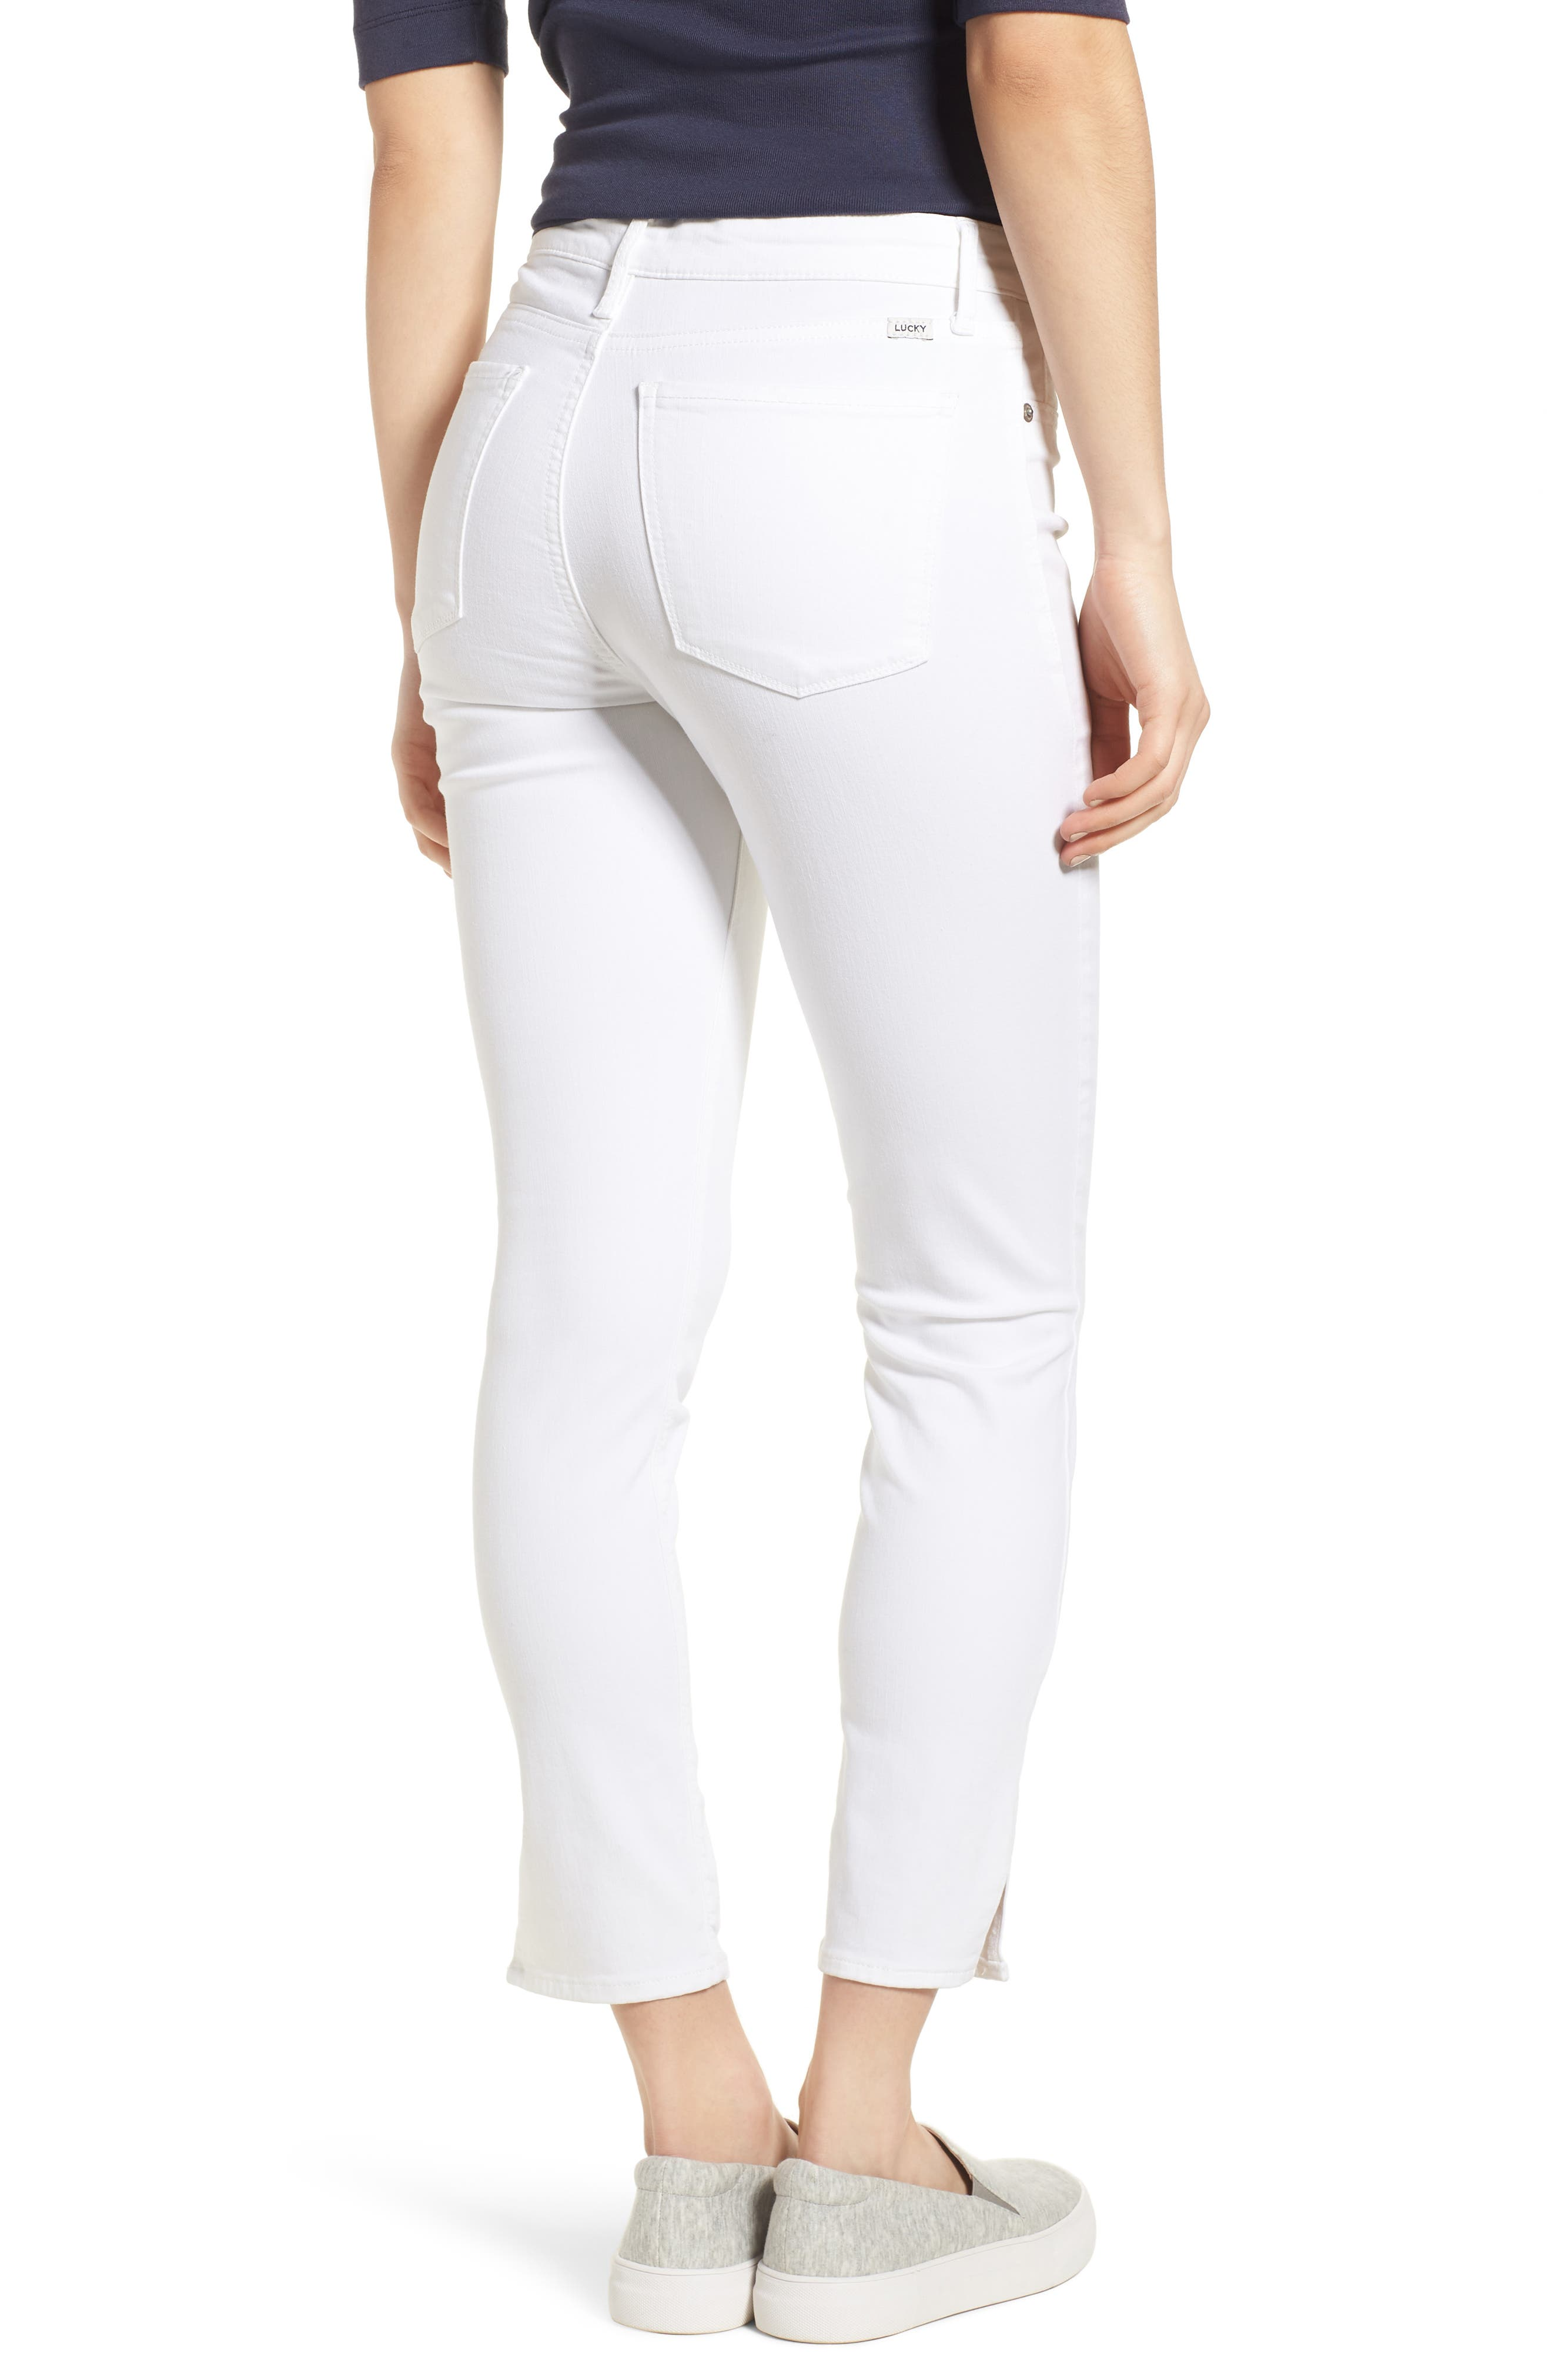 Ava Skinny White Jeans,                             Alternate thumbnail 2, color,                             Clean White